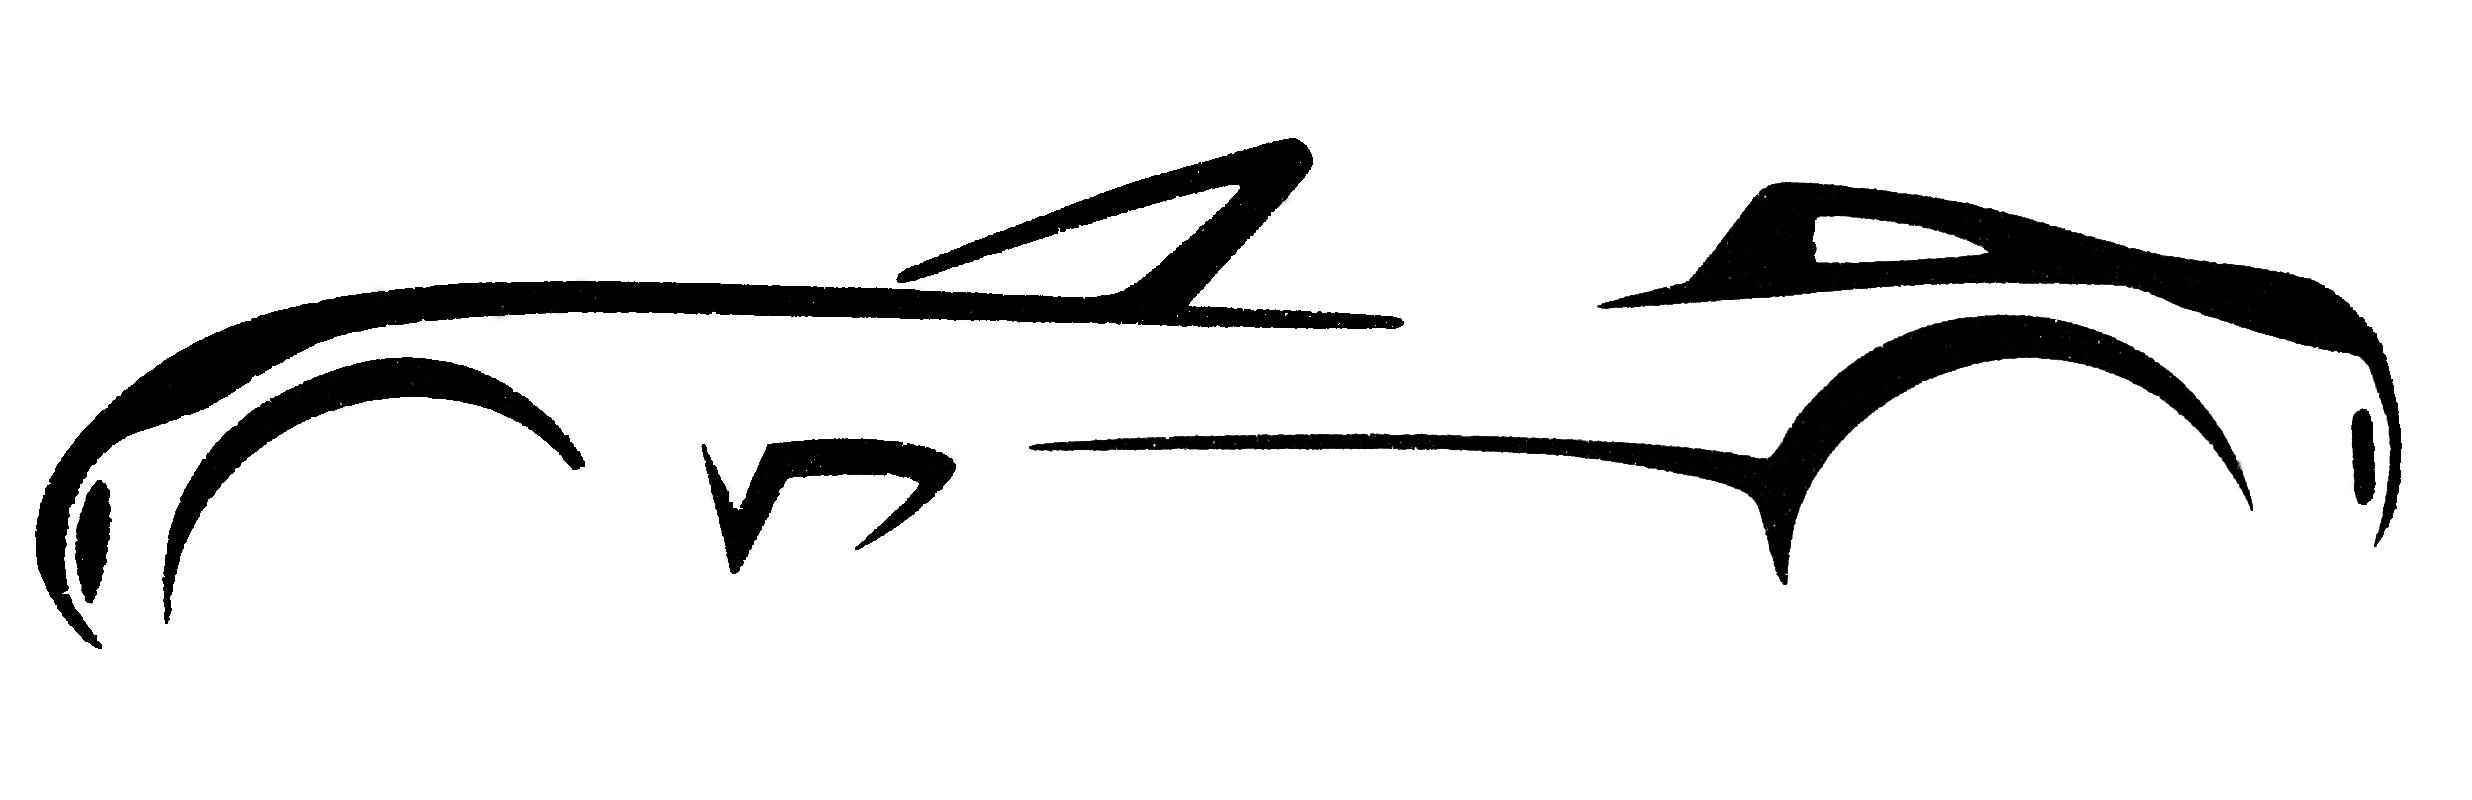 2472x800 Depositphotos Sport Car Silhouette Logo Clip Art